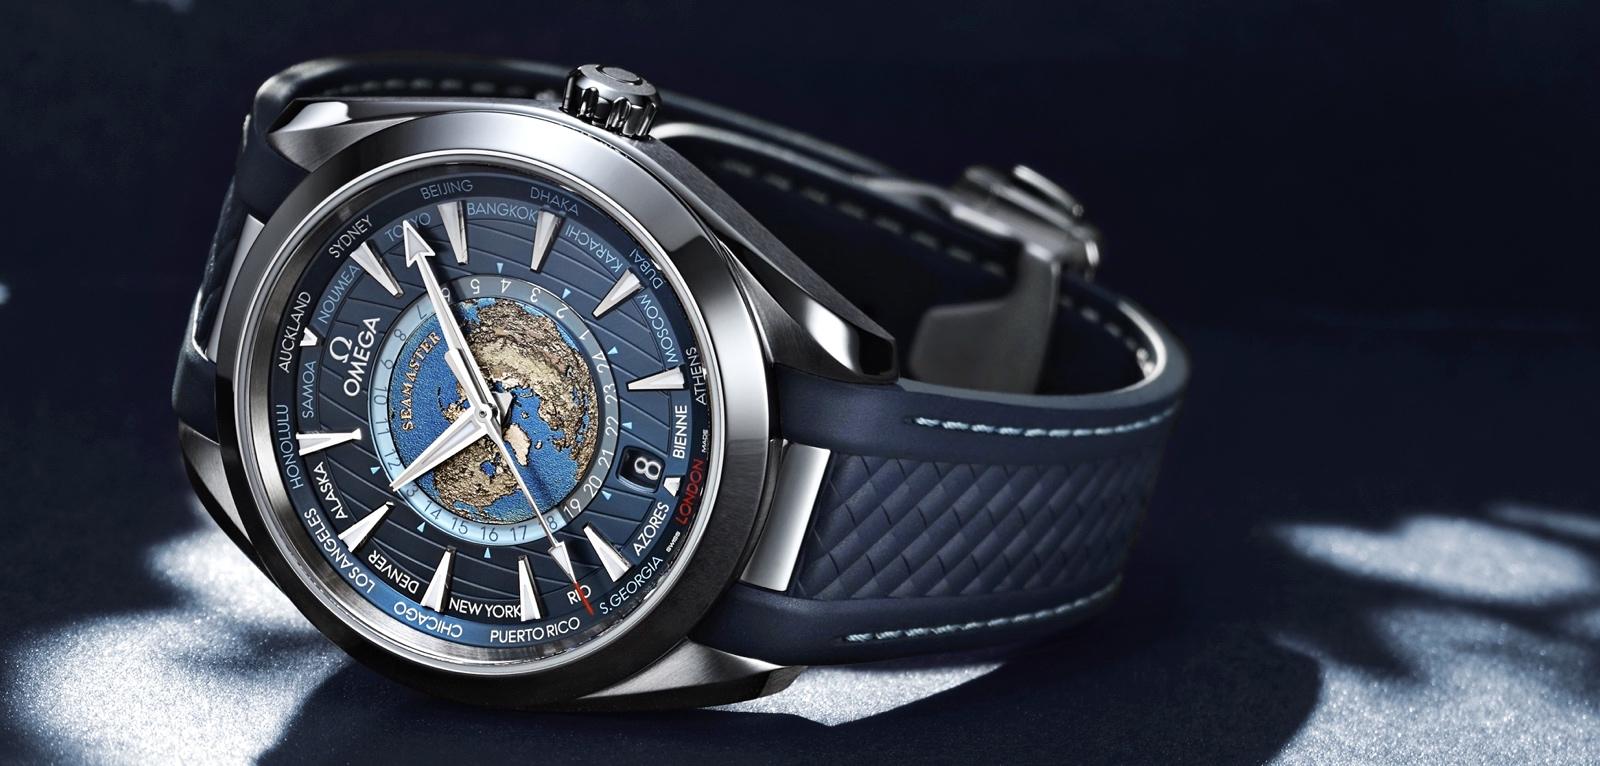 Omega Seamaster Aqua Terra Worldtimer Cover